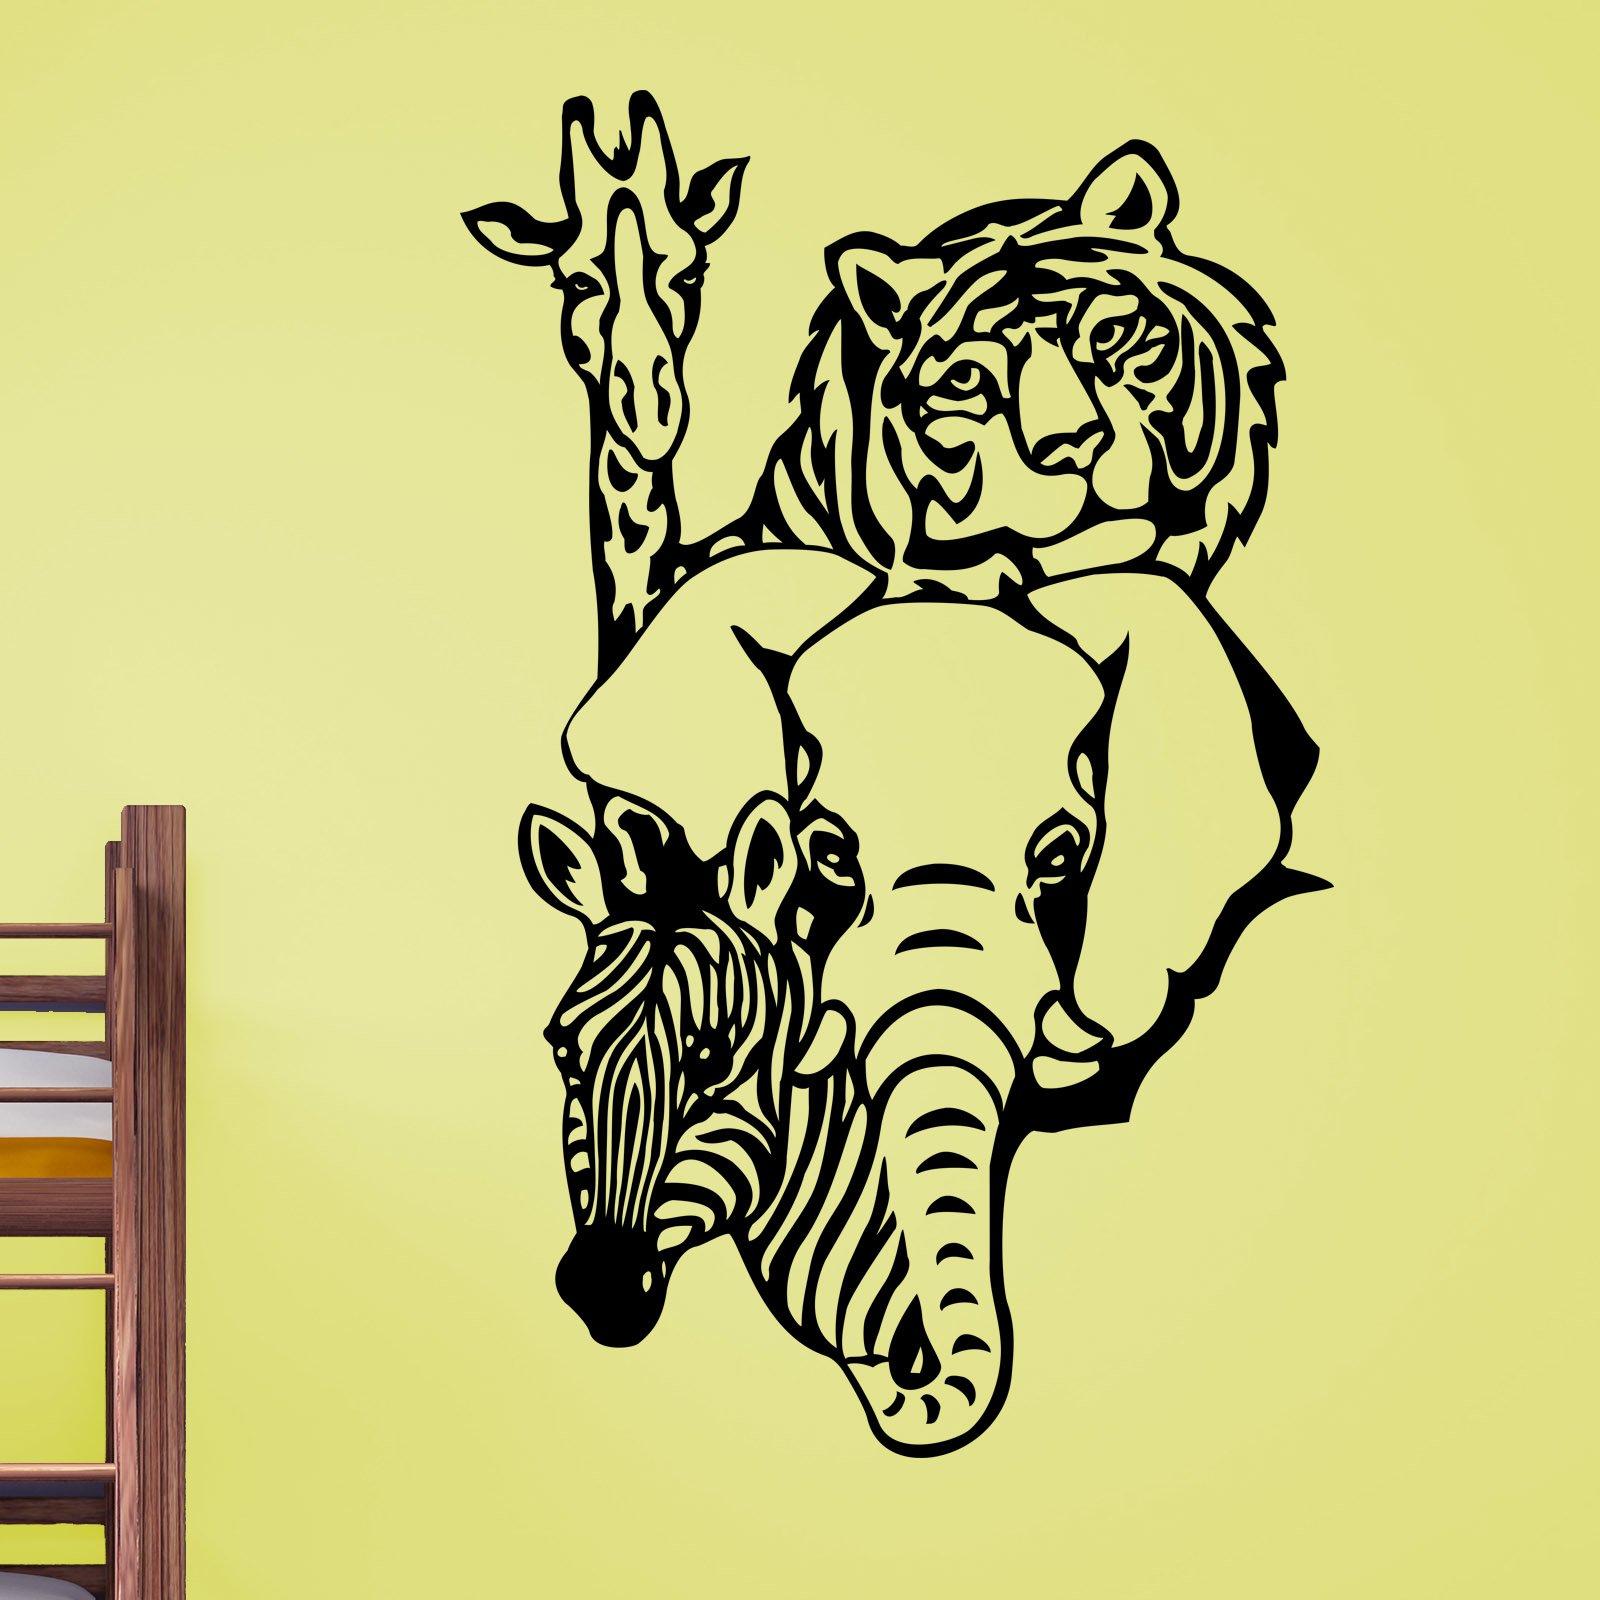 Tiger Giraffe Elephant Zebra Animal Wall Sticker - World of Wall ...